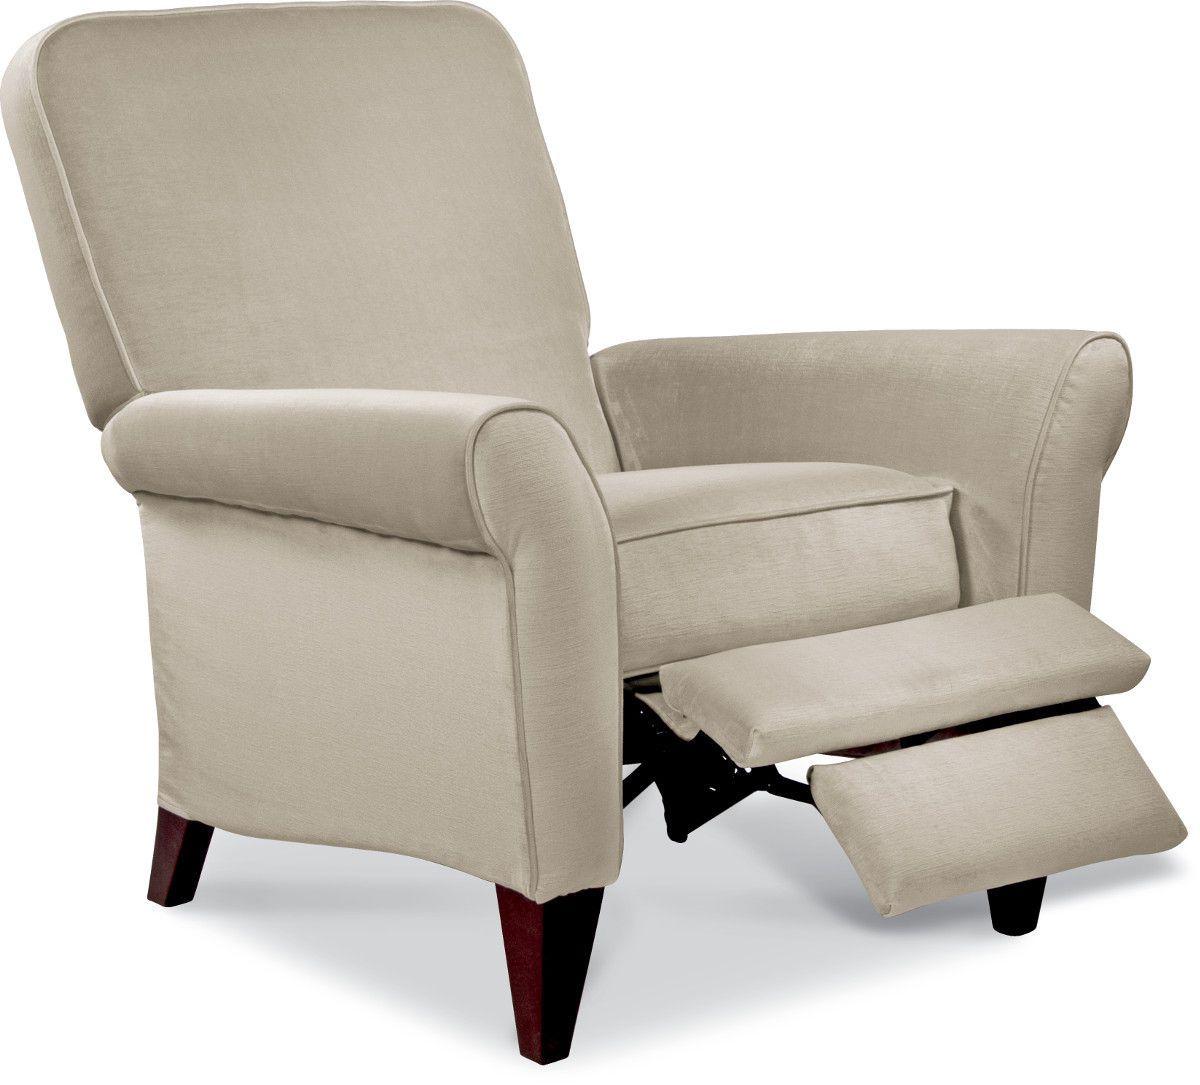 La-Z-Boy Living Room High Leg Recliner - 2 Position Mechanism 028450 ...